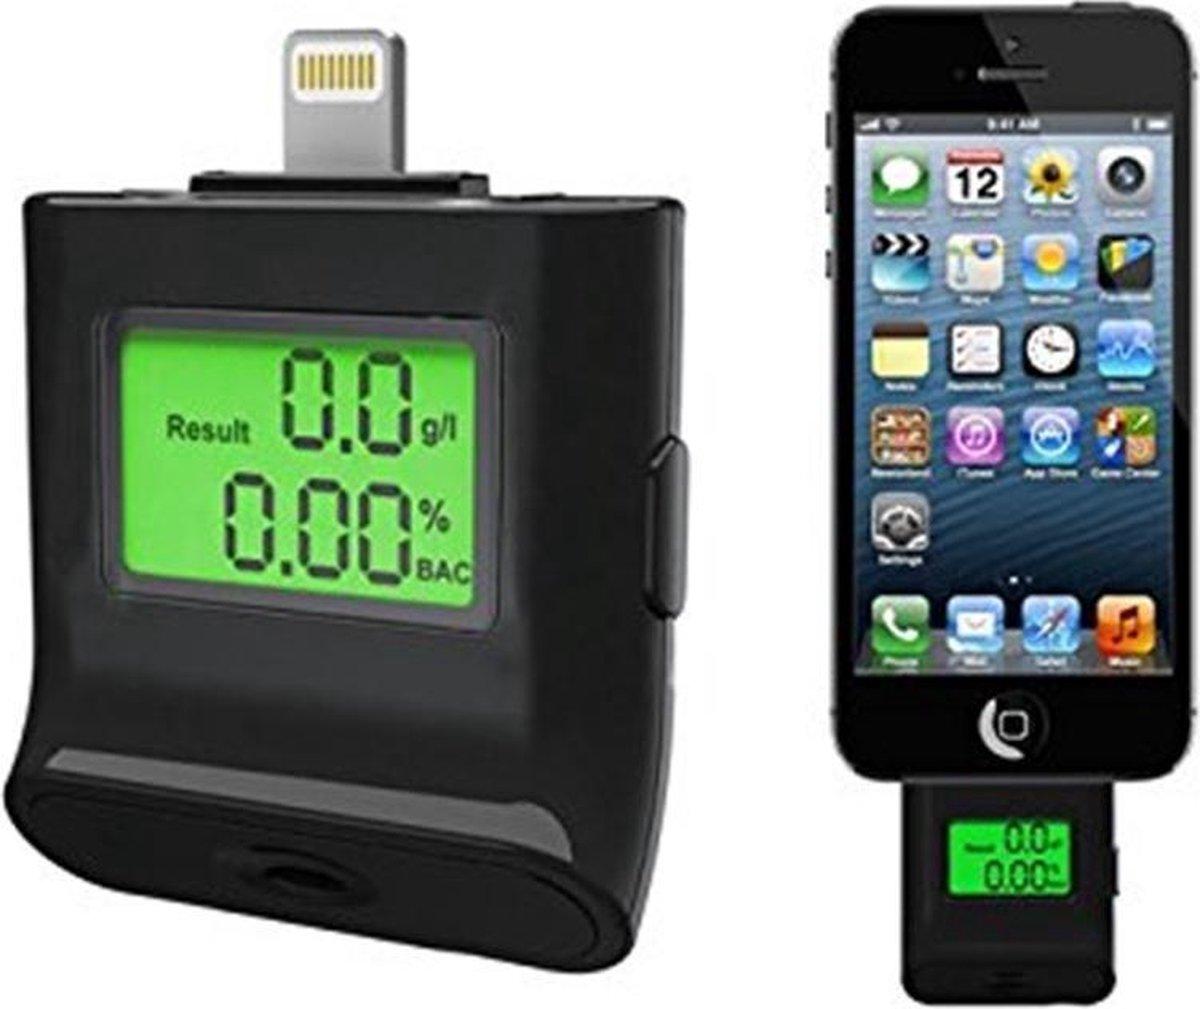 Alcohol tester   alcholtesten   smartphone   iphone 5,6,7  blaastest   alcohol   IOS   Ipad mini, air   gadget - JY&K